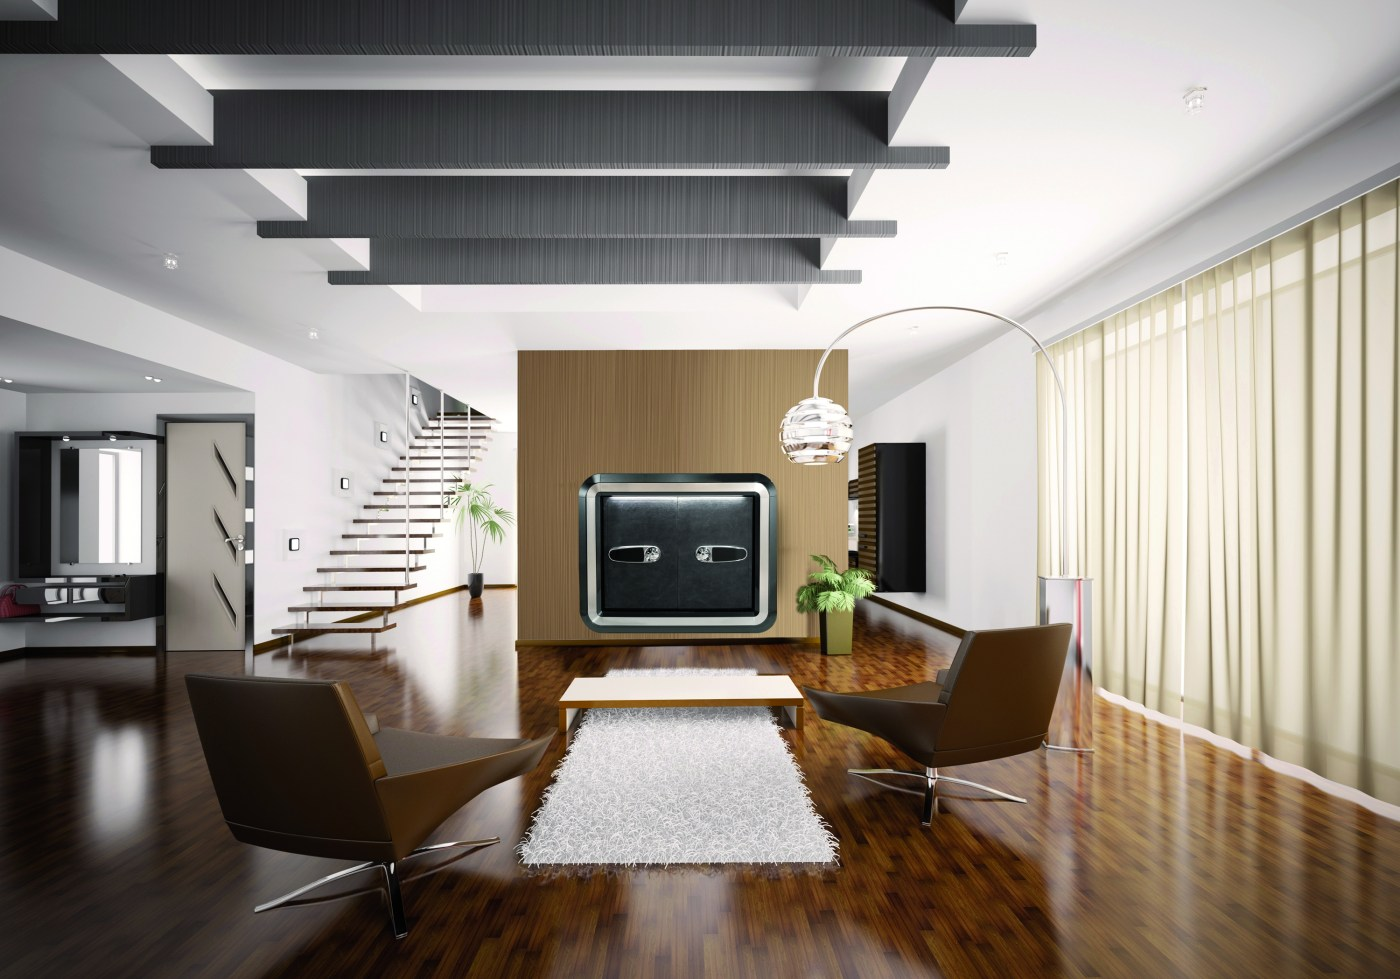 BUBEN&ZORWEG Vision Inbuilt Luxurious Interiors